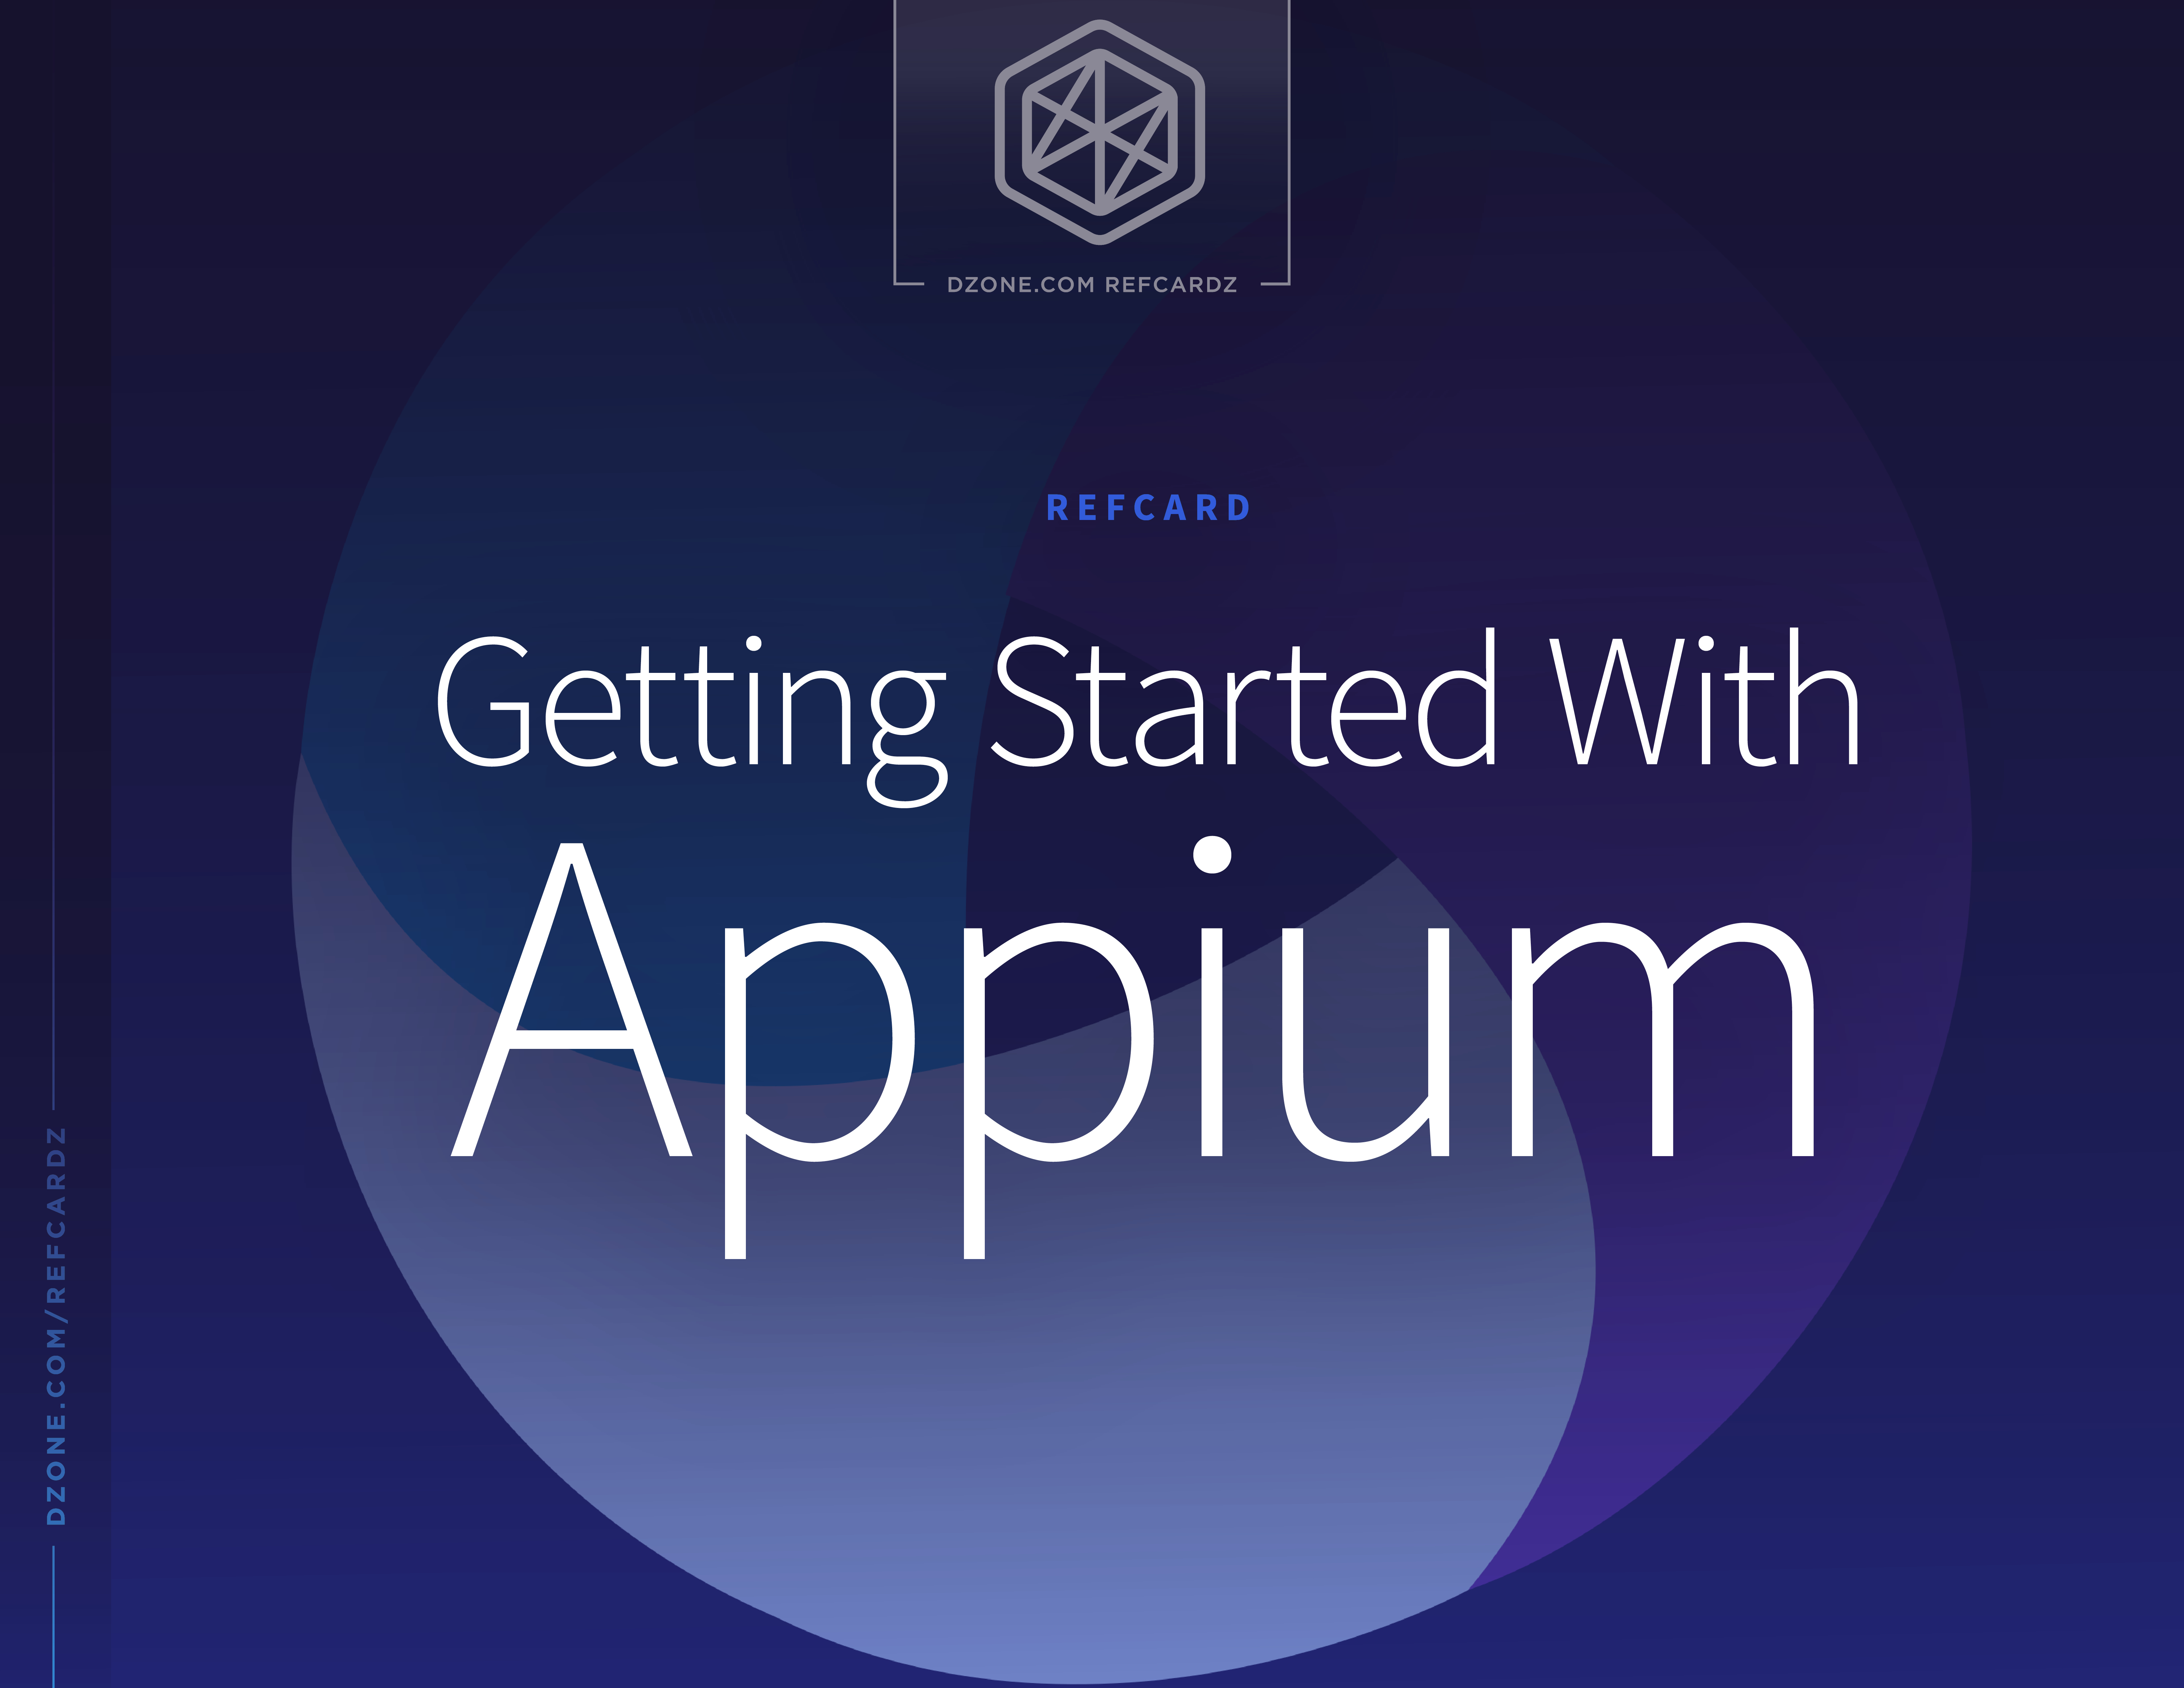 Getting Started With Appium - DZone - Refcardz